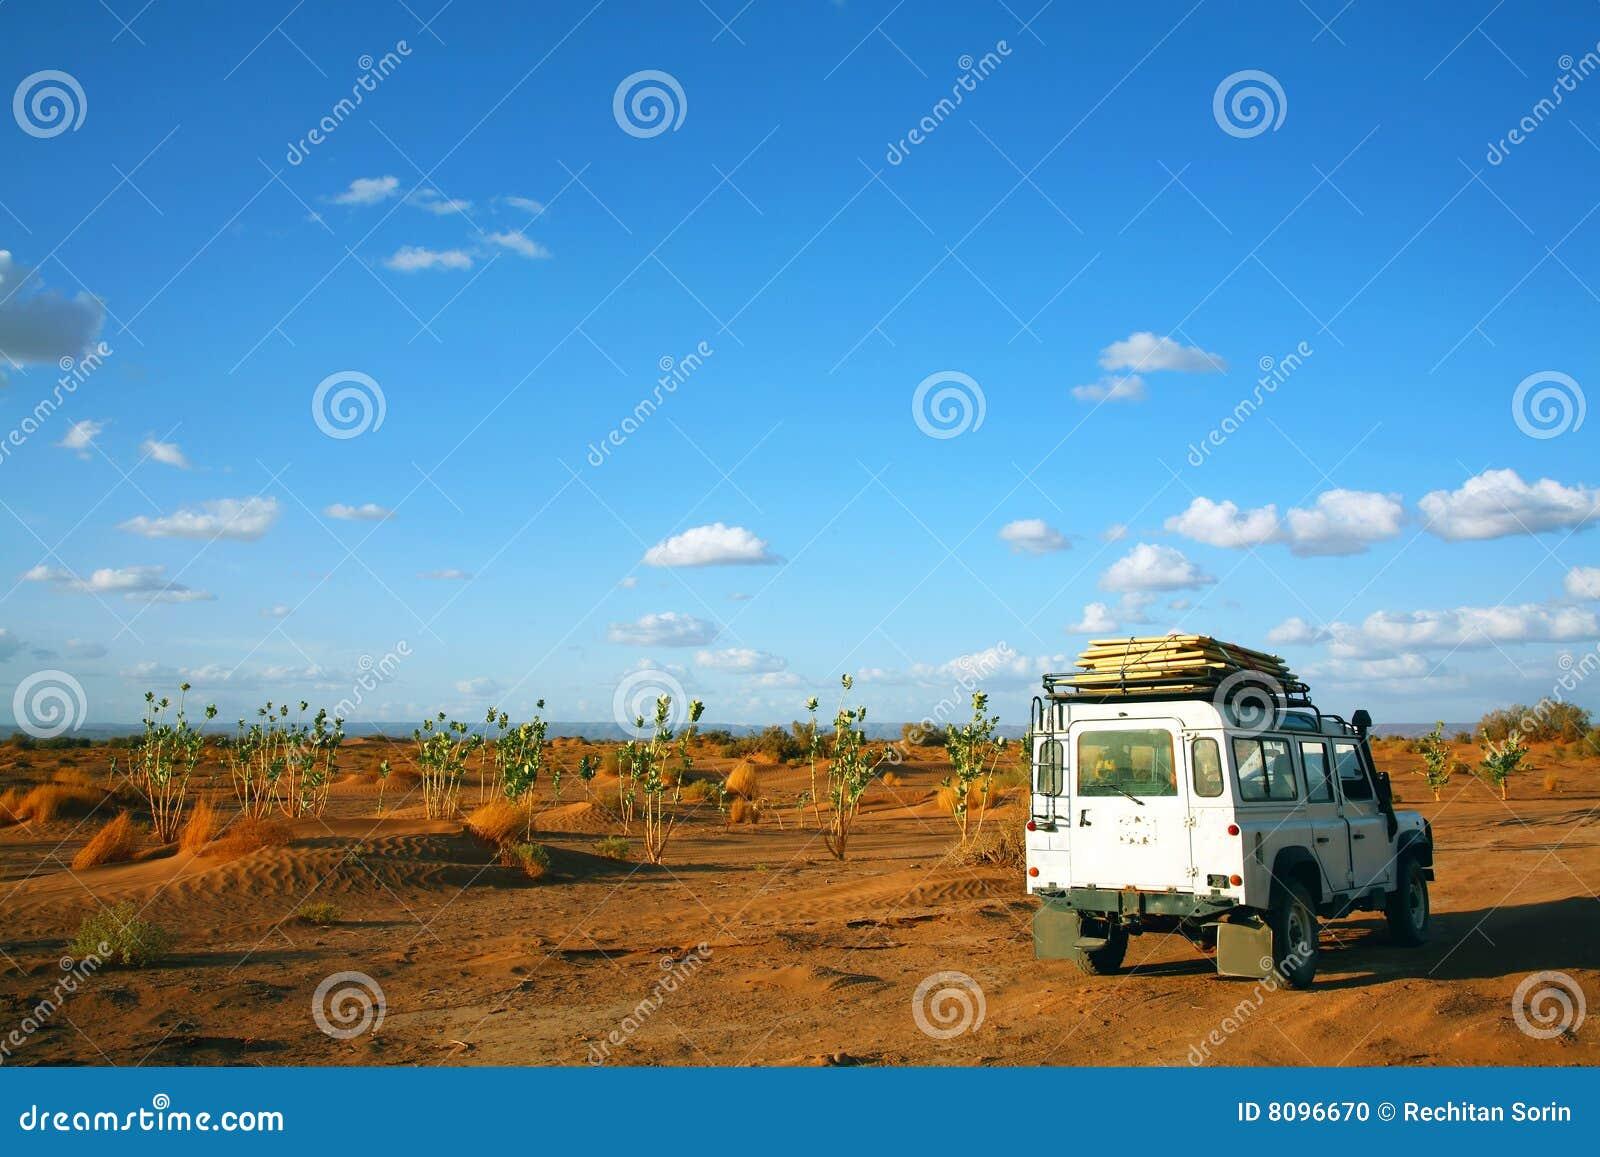 Safari in Sahara Desert